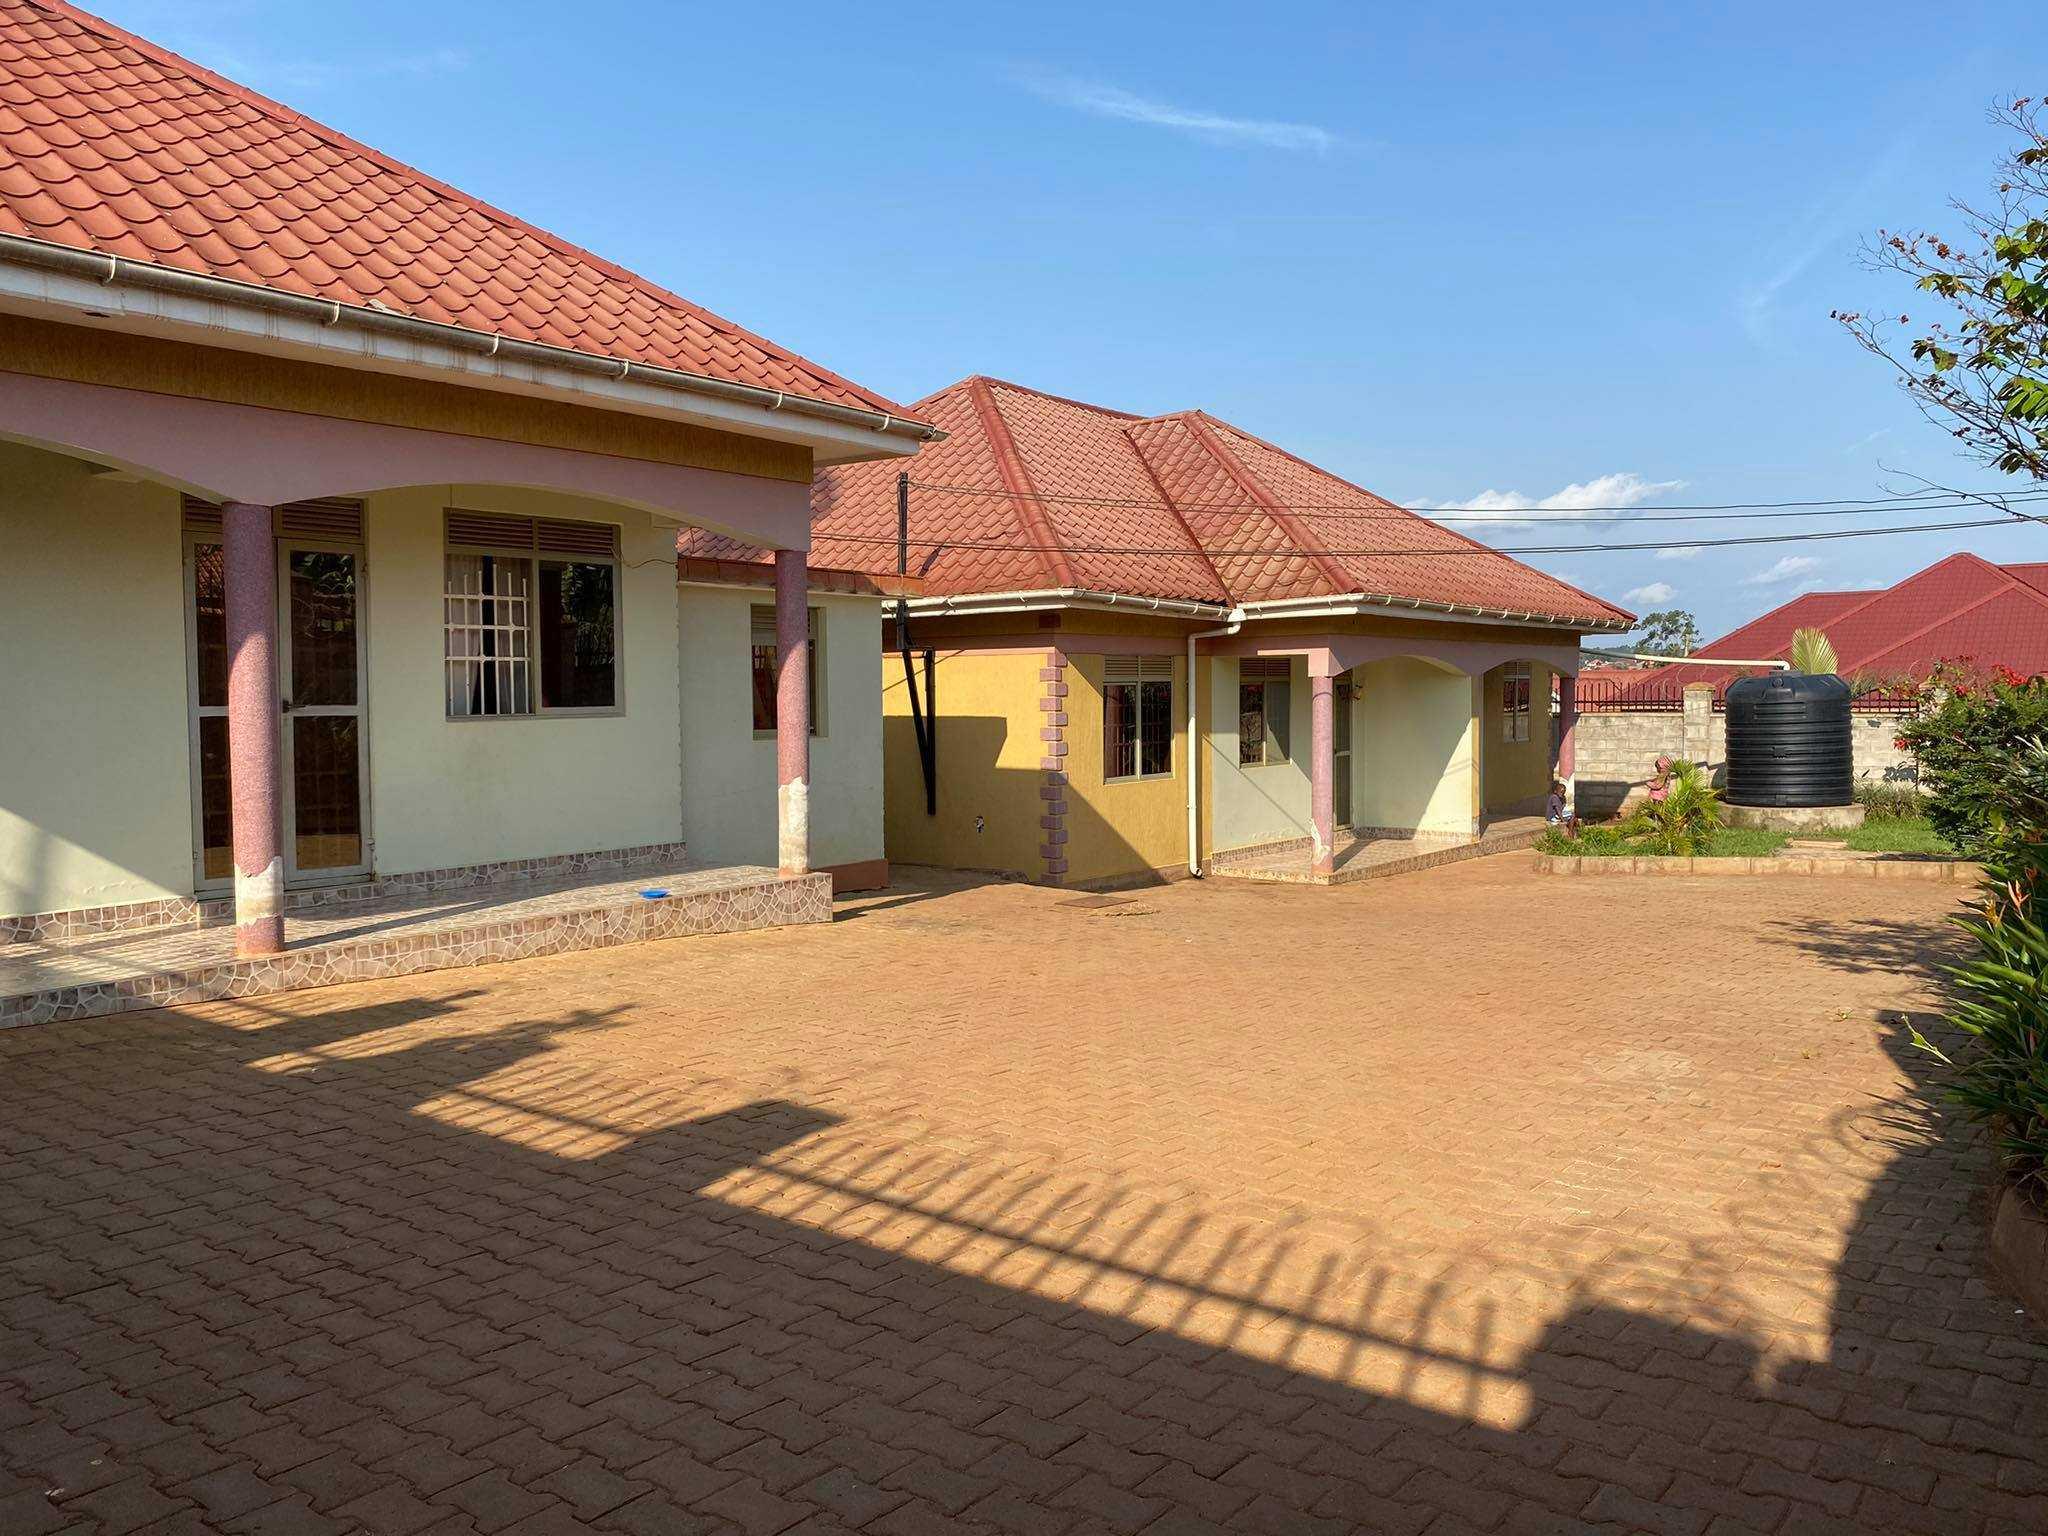 Kiira estate-WPS249